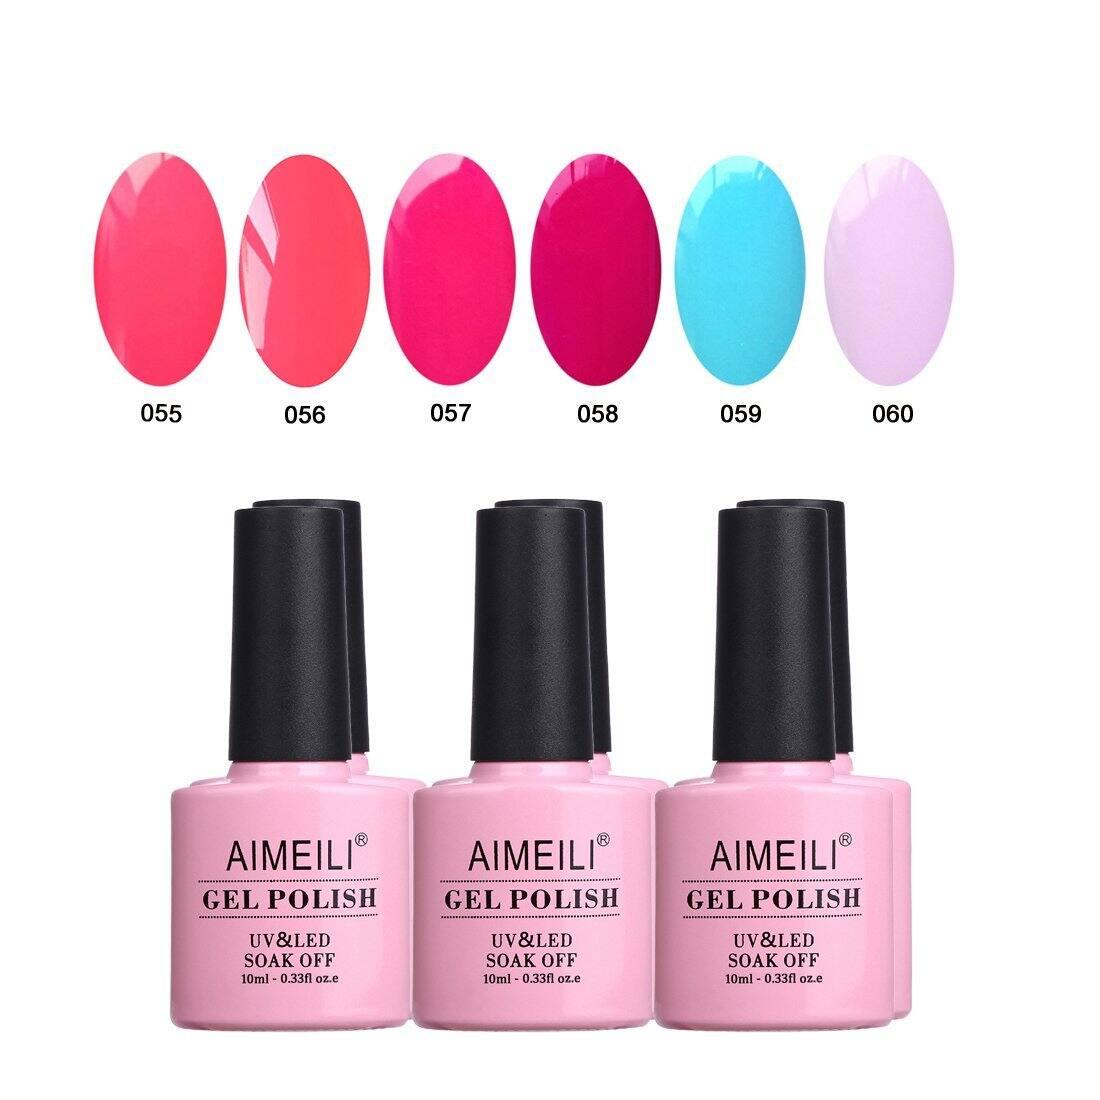 AIMEILI Gel Nail Polish Color Set Of 6pcs X 10ml - Kit 12 for - $10 + Free Shipping w/ Amazon Prime or Orders $25